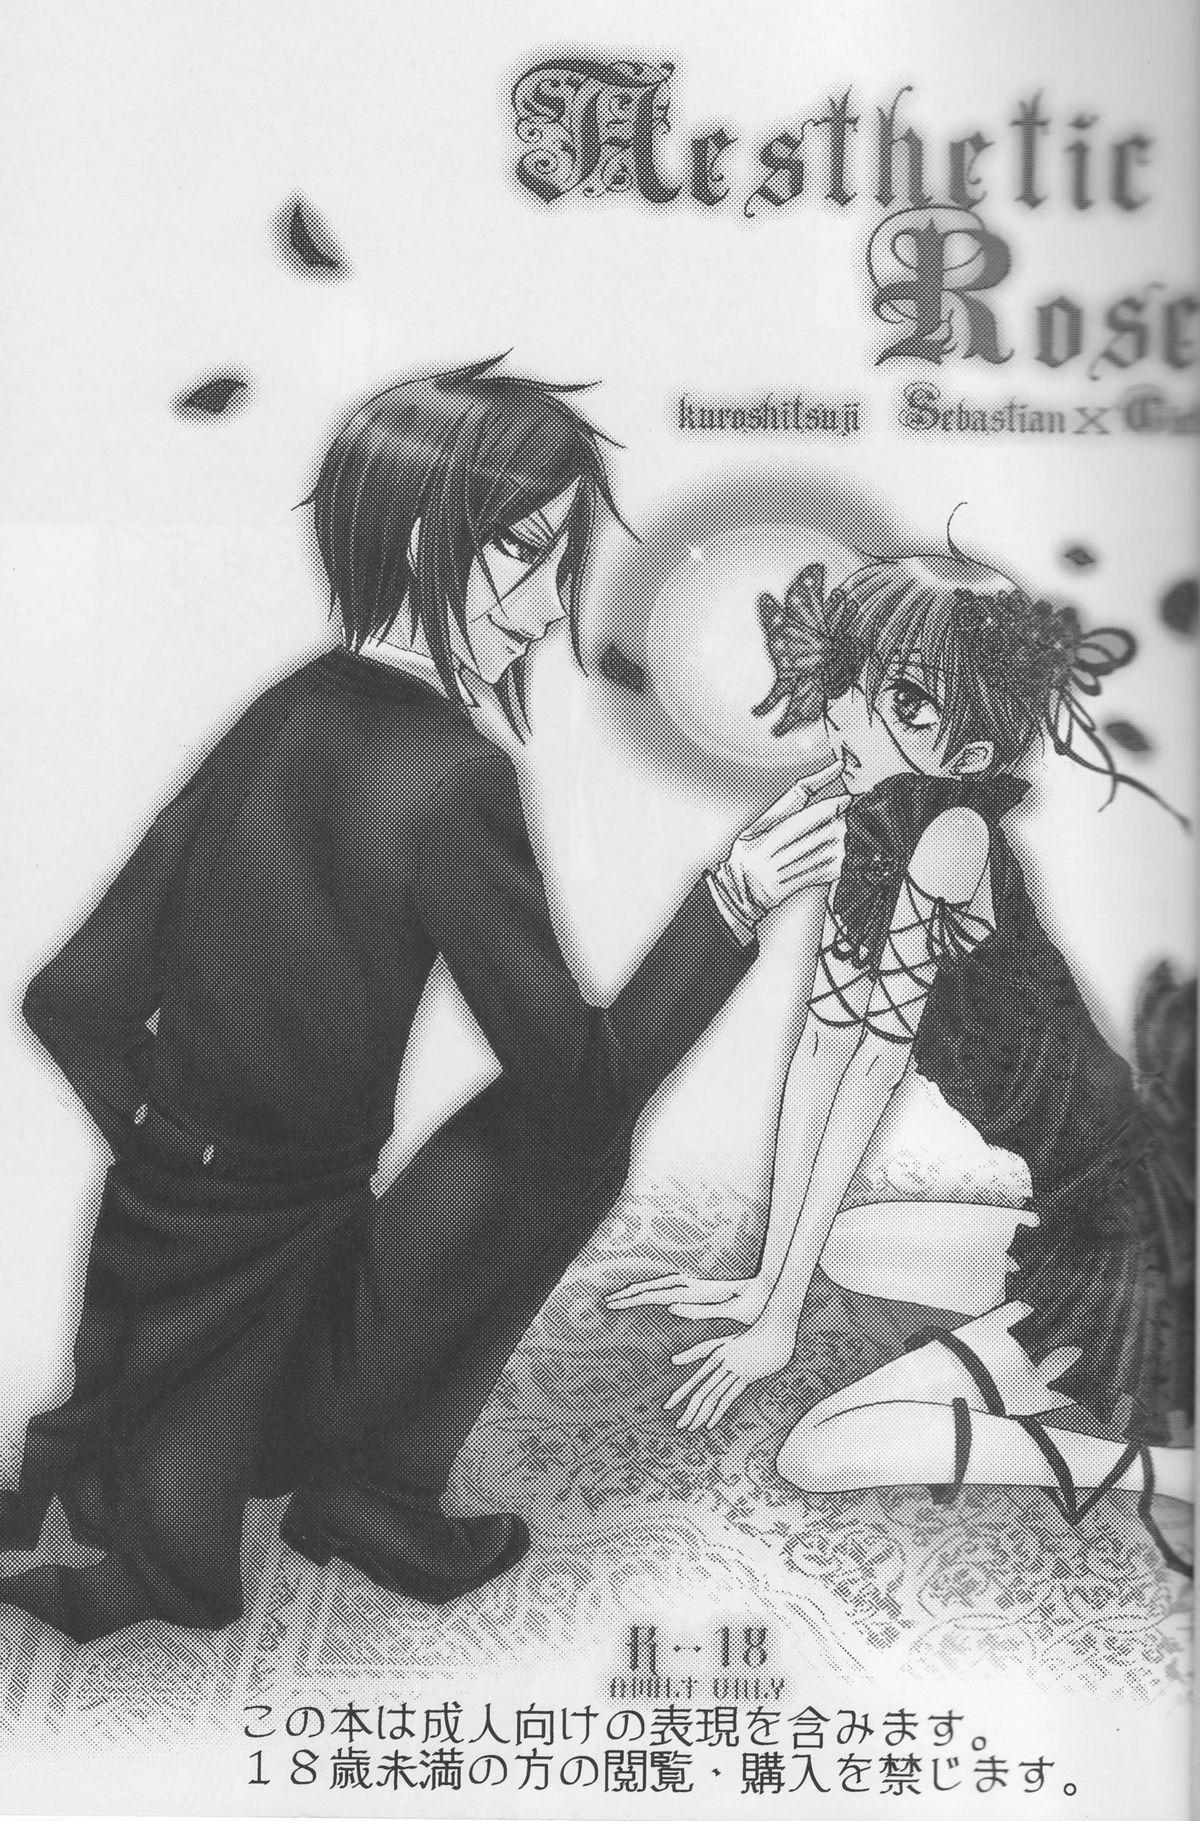 Kuroshitsuji  - Aesthetic Rose 1